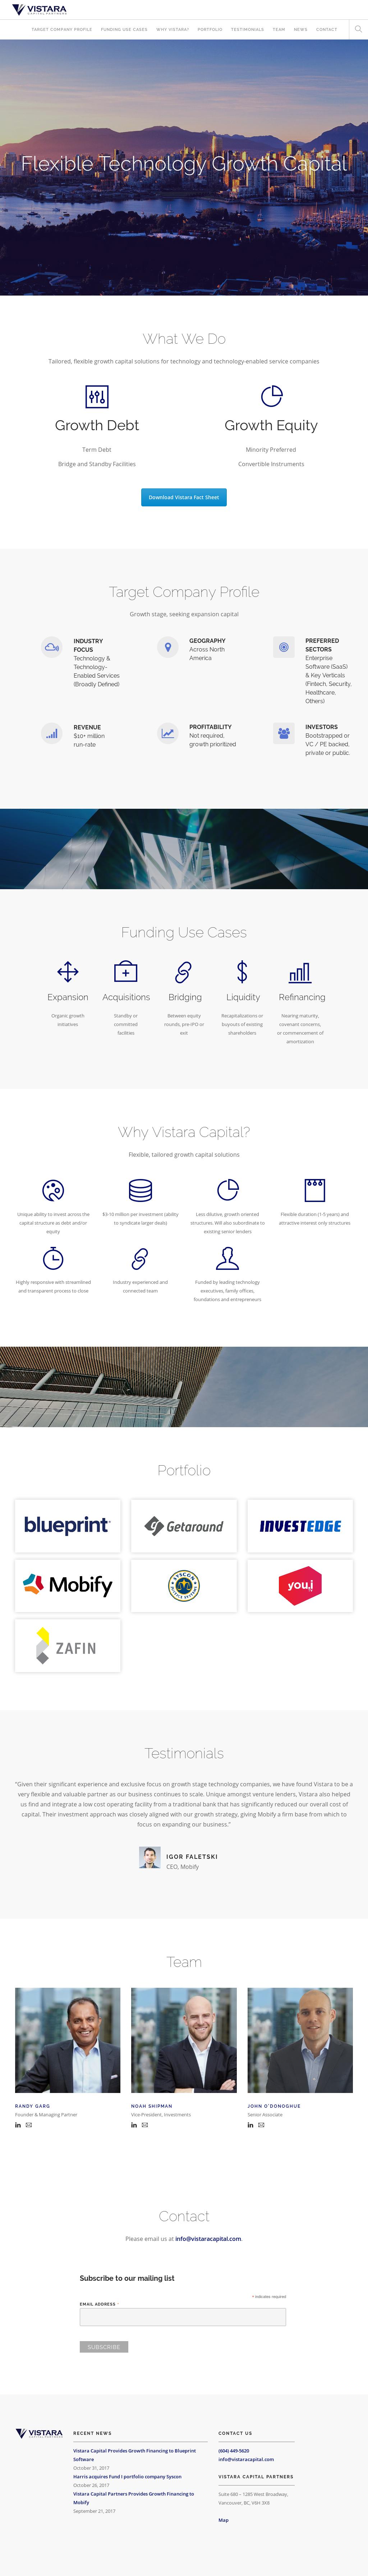 Vistara capital partners competitors revenue and employees owler vistara capital partners website history malvernweather Image collections